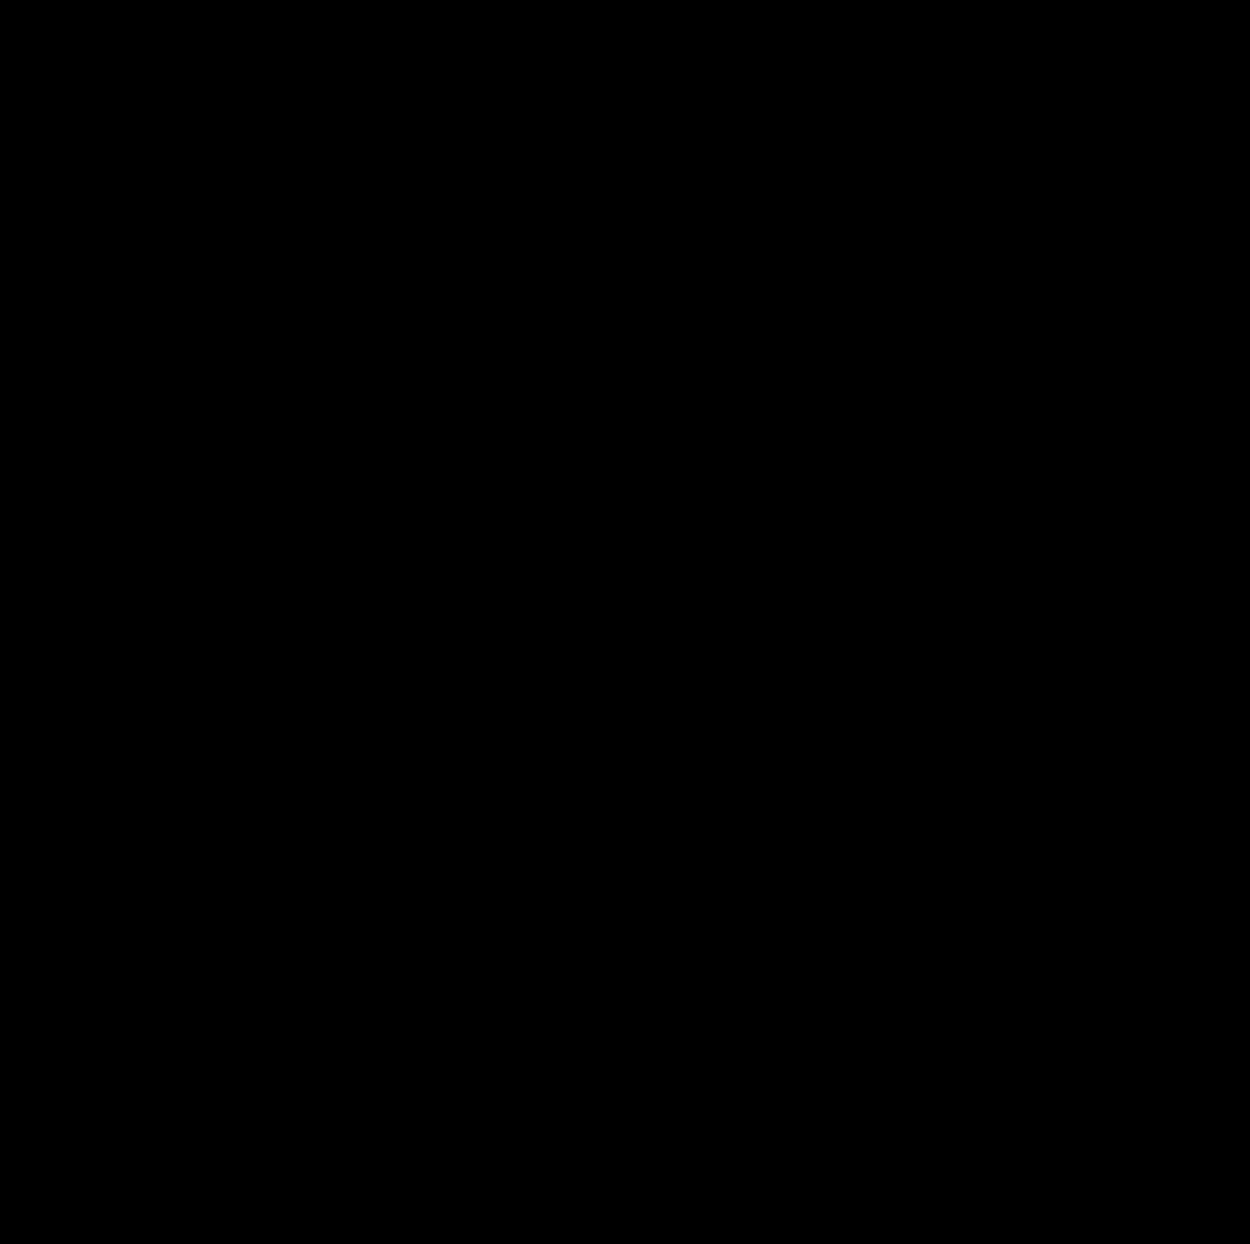 3Box logo